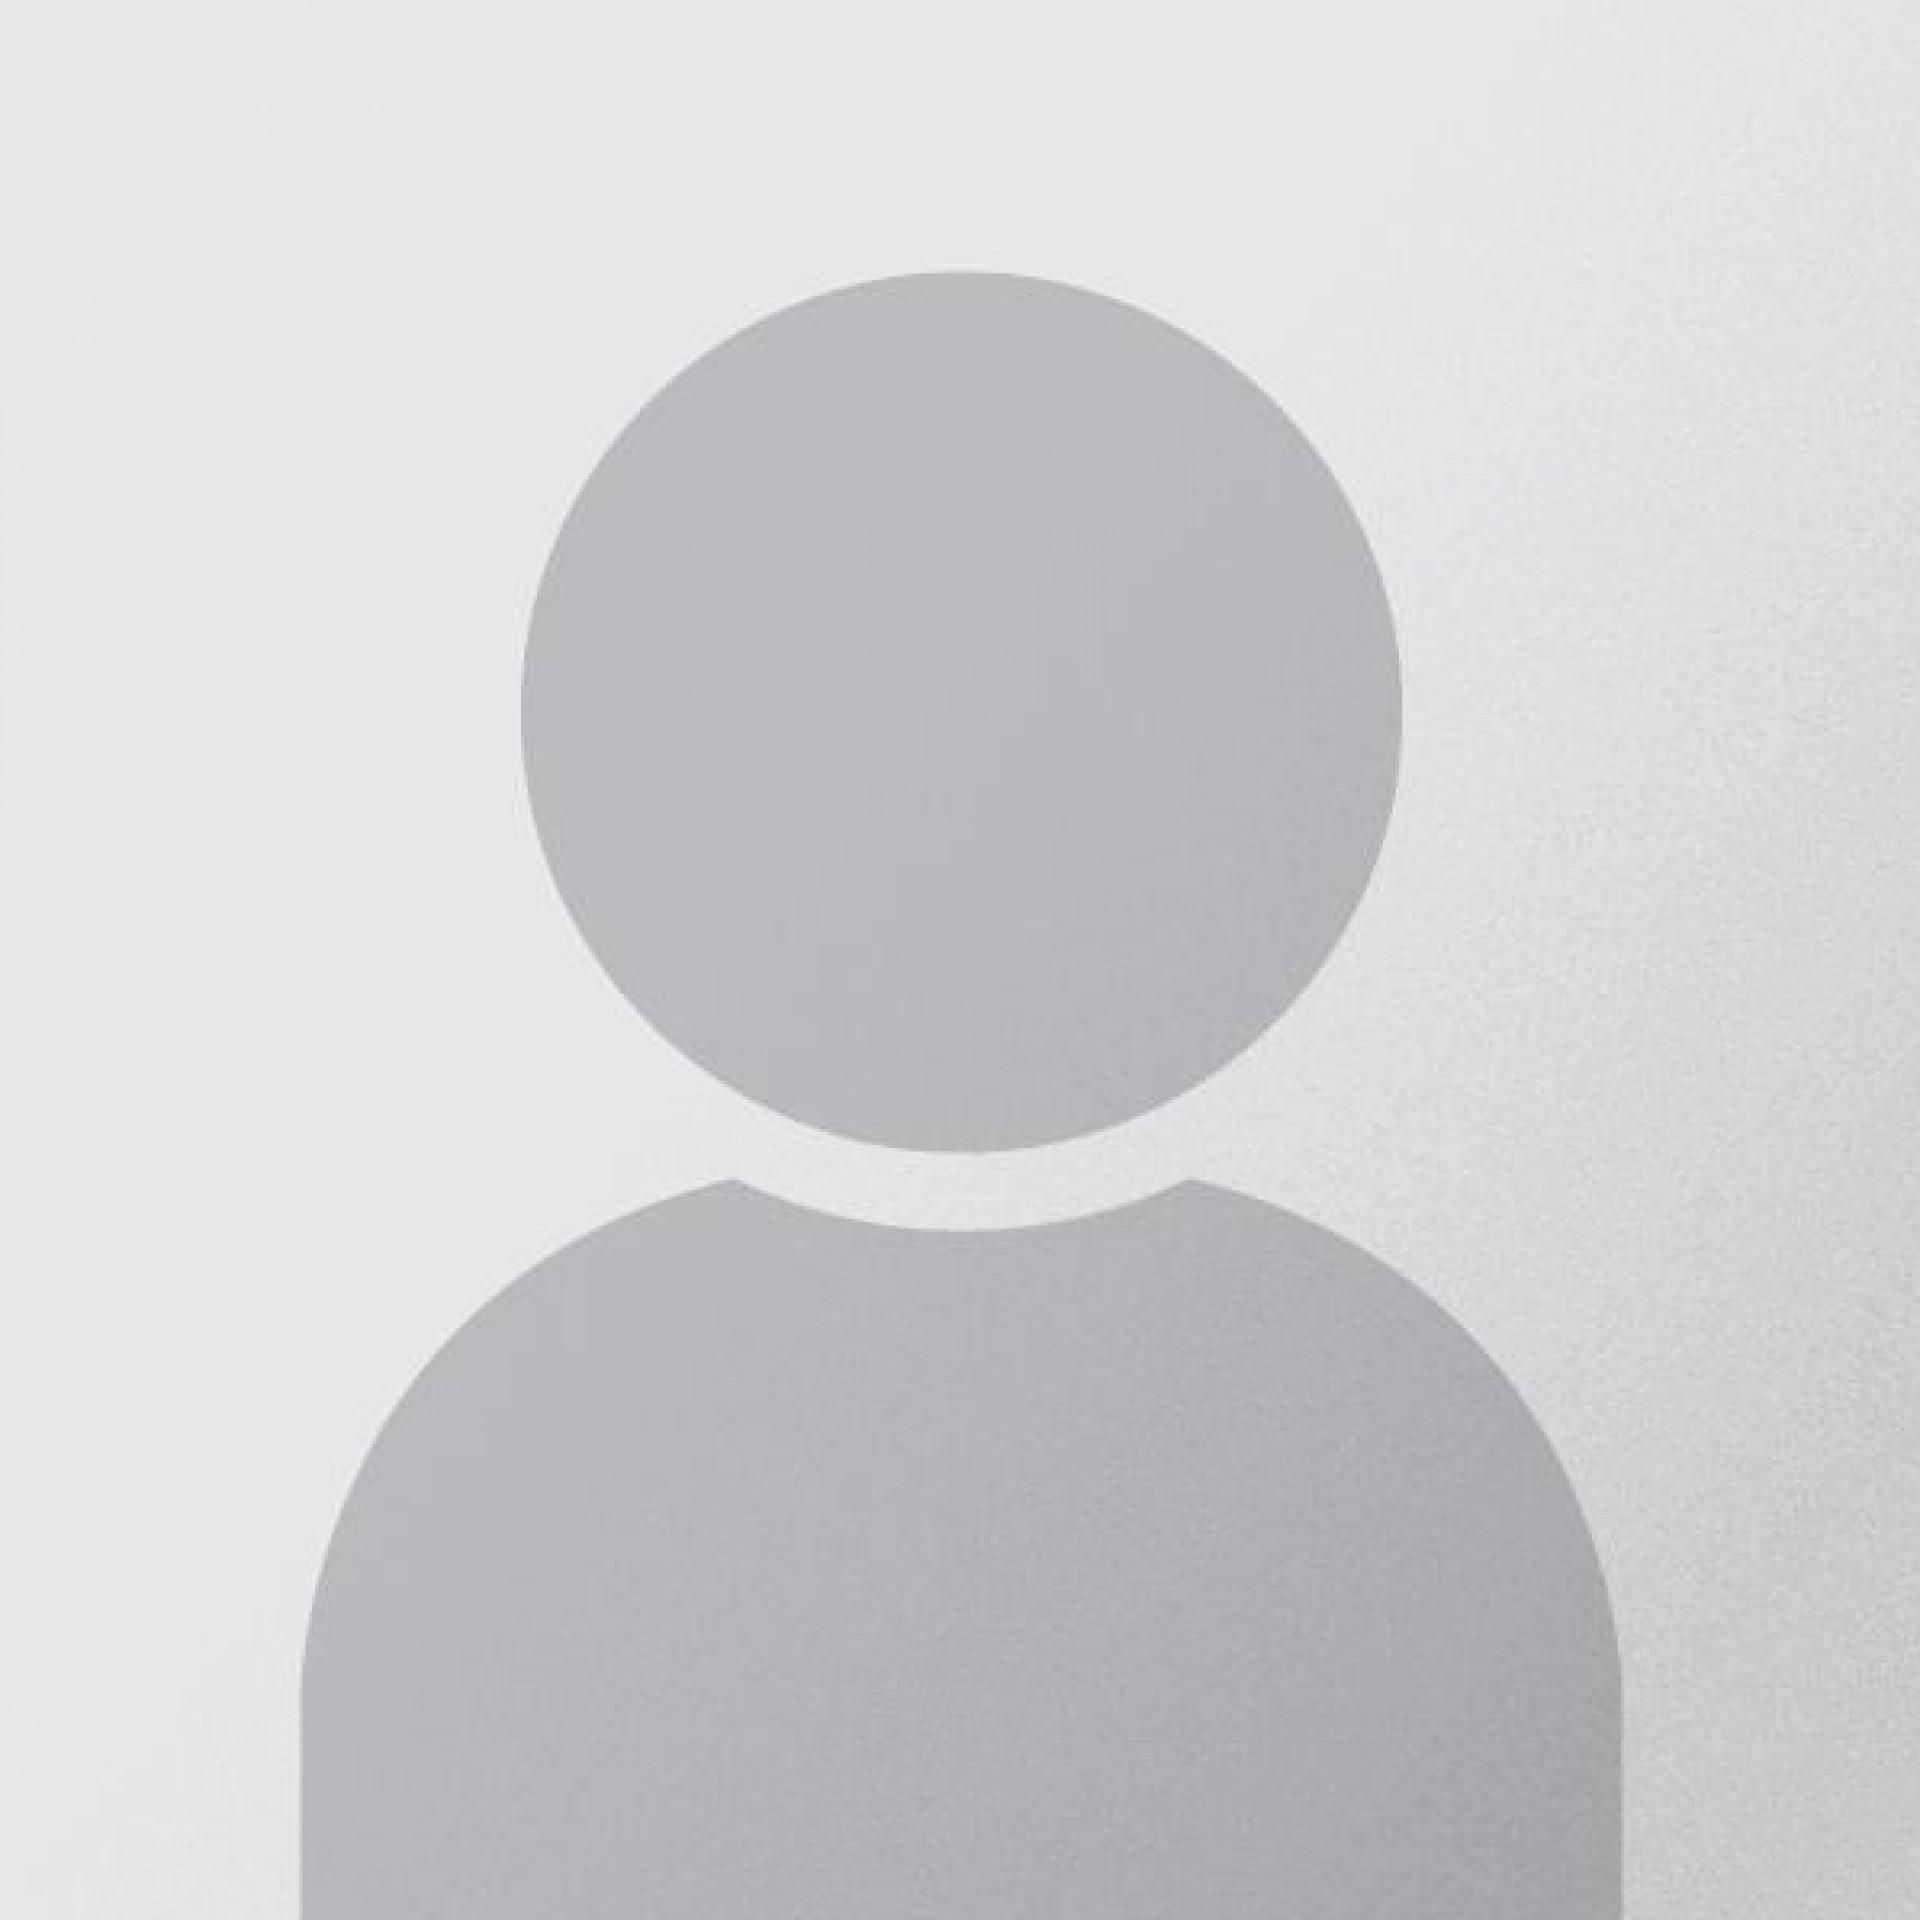 fotografia p021 profilu 01028E45AK